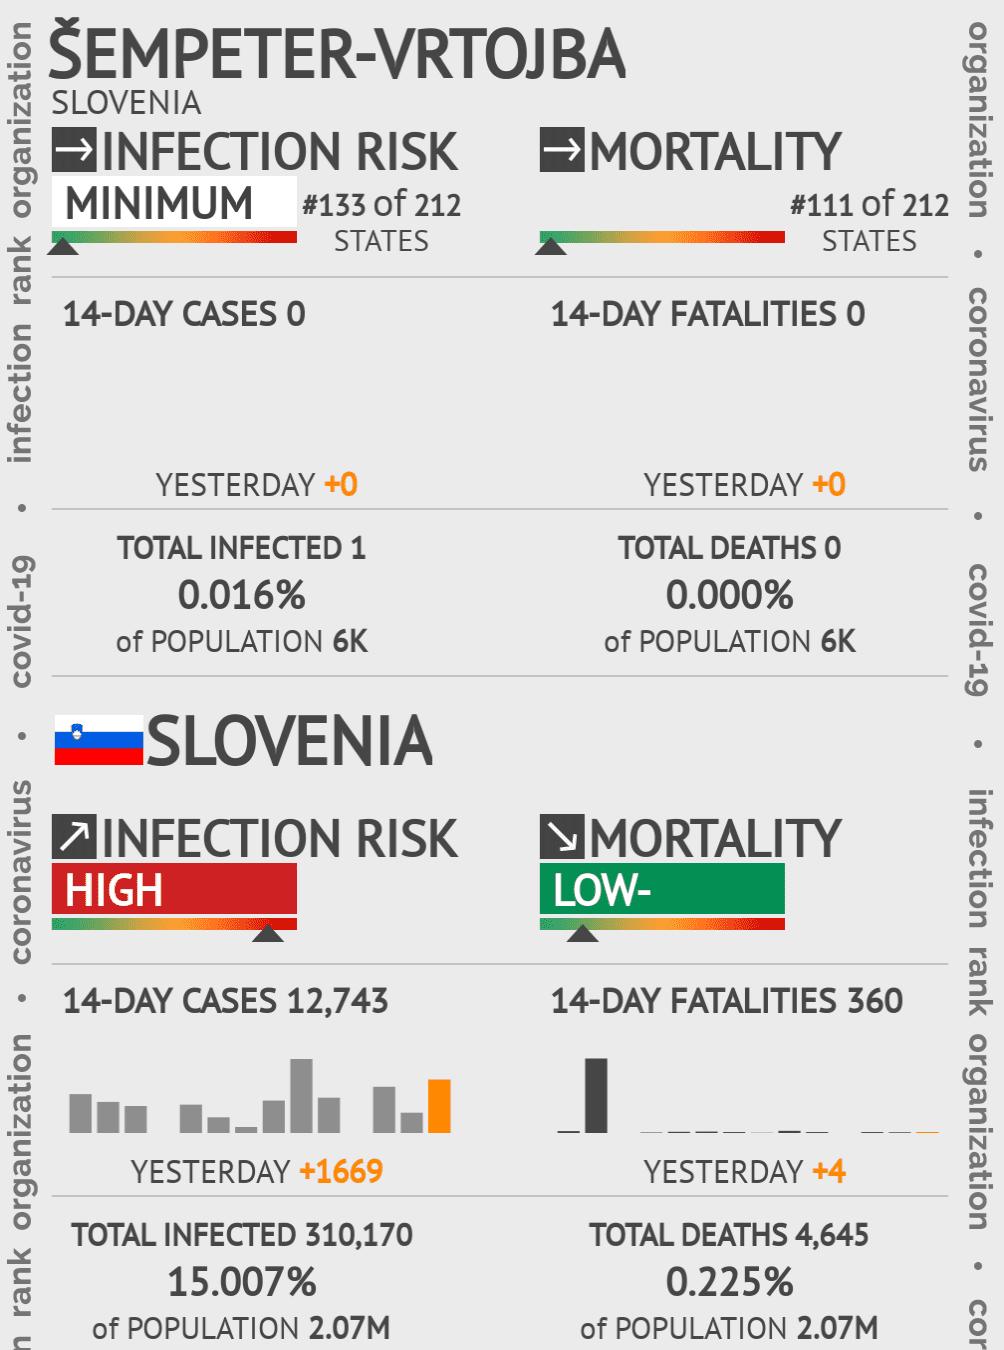 Šempeter-Vrtojba Coronavirus Covid-19 Risk of Infection on May 14, 2020